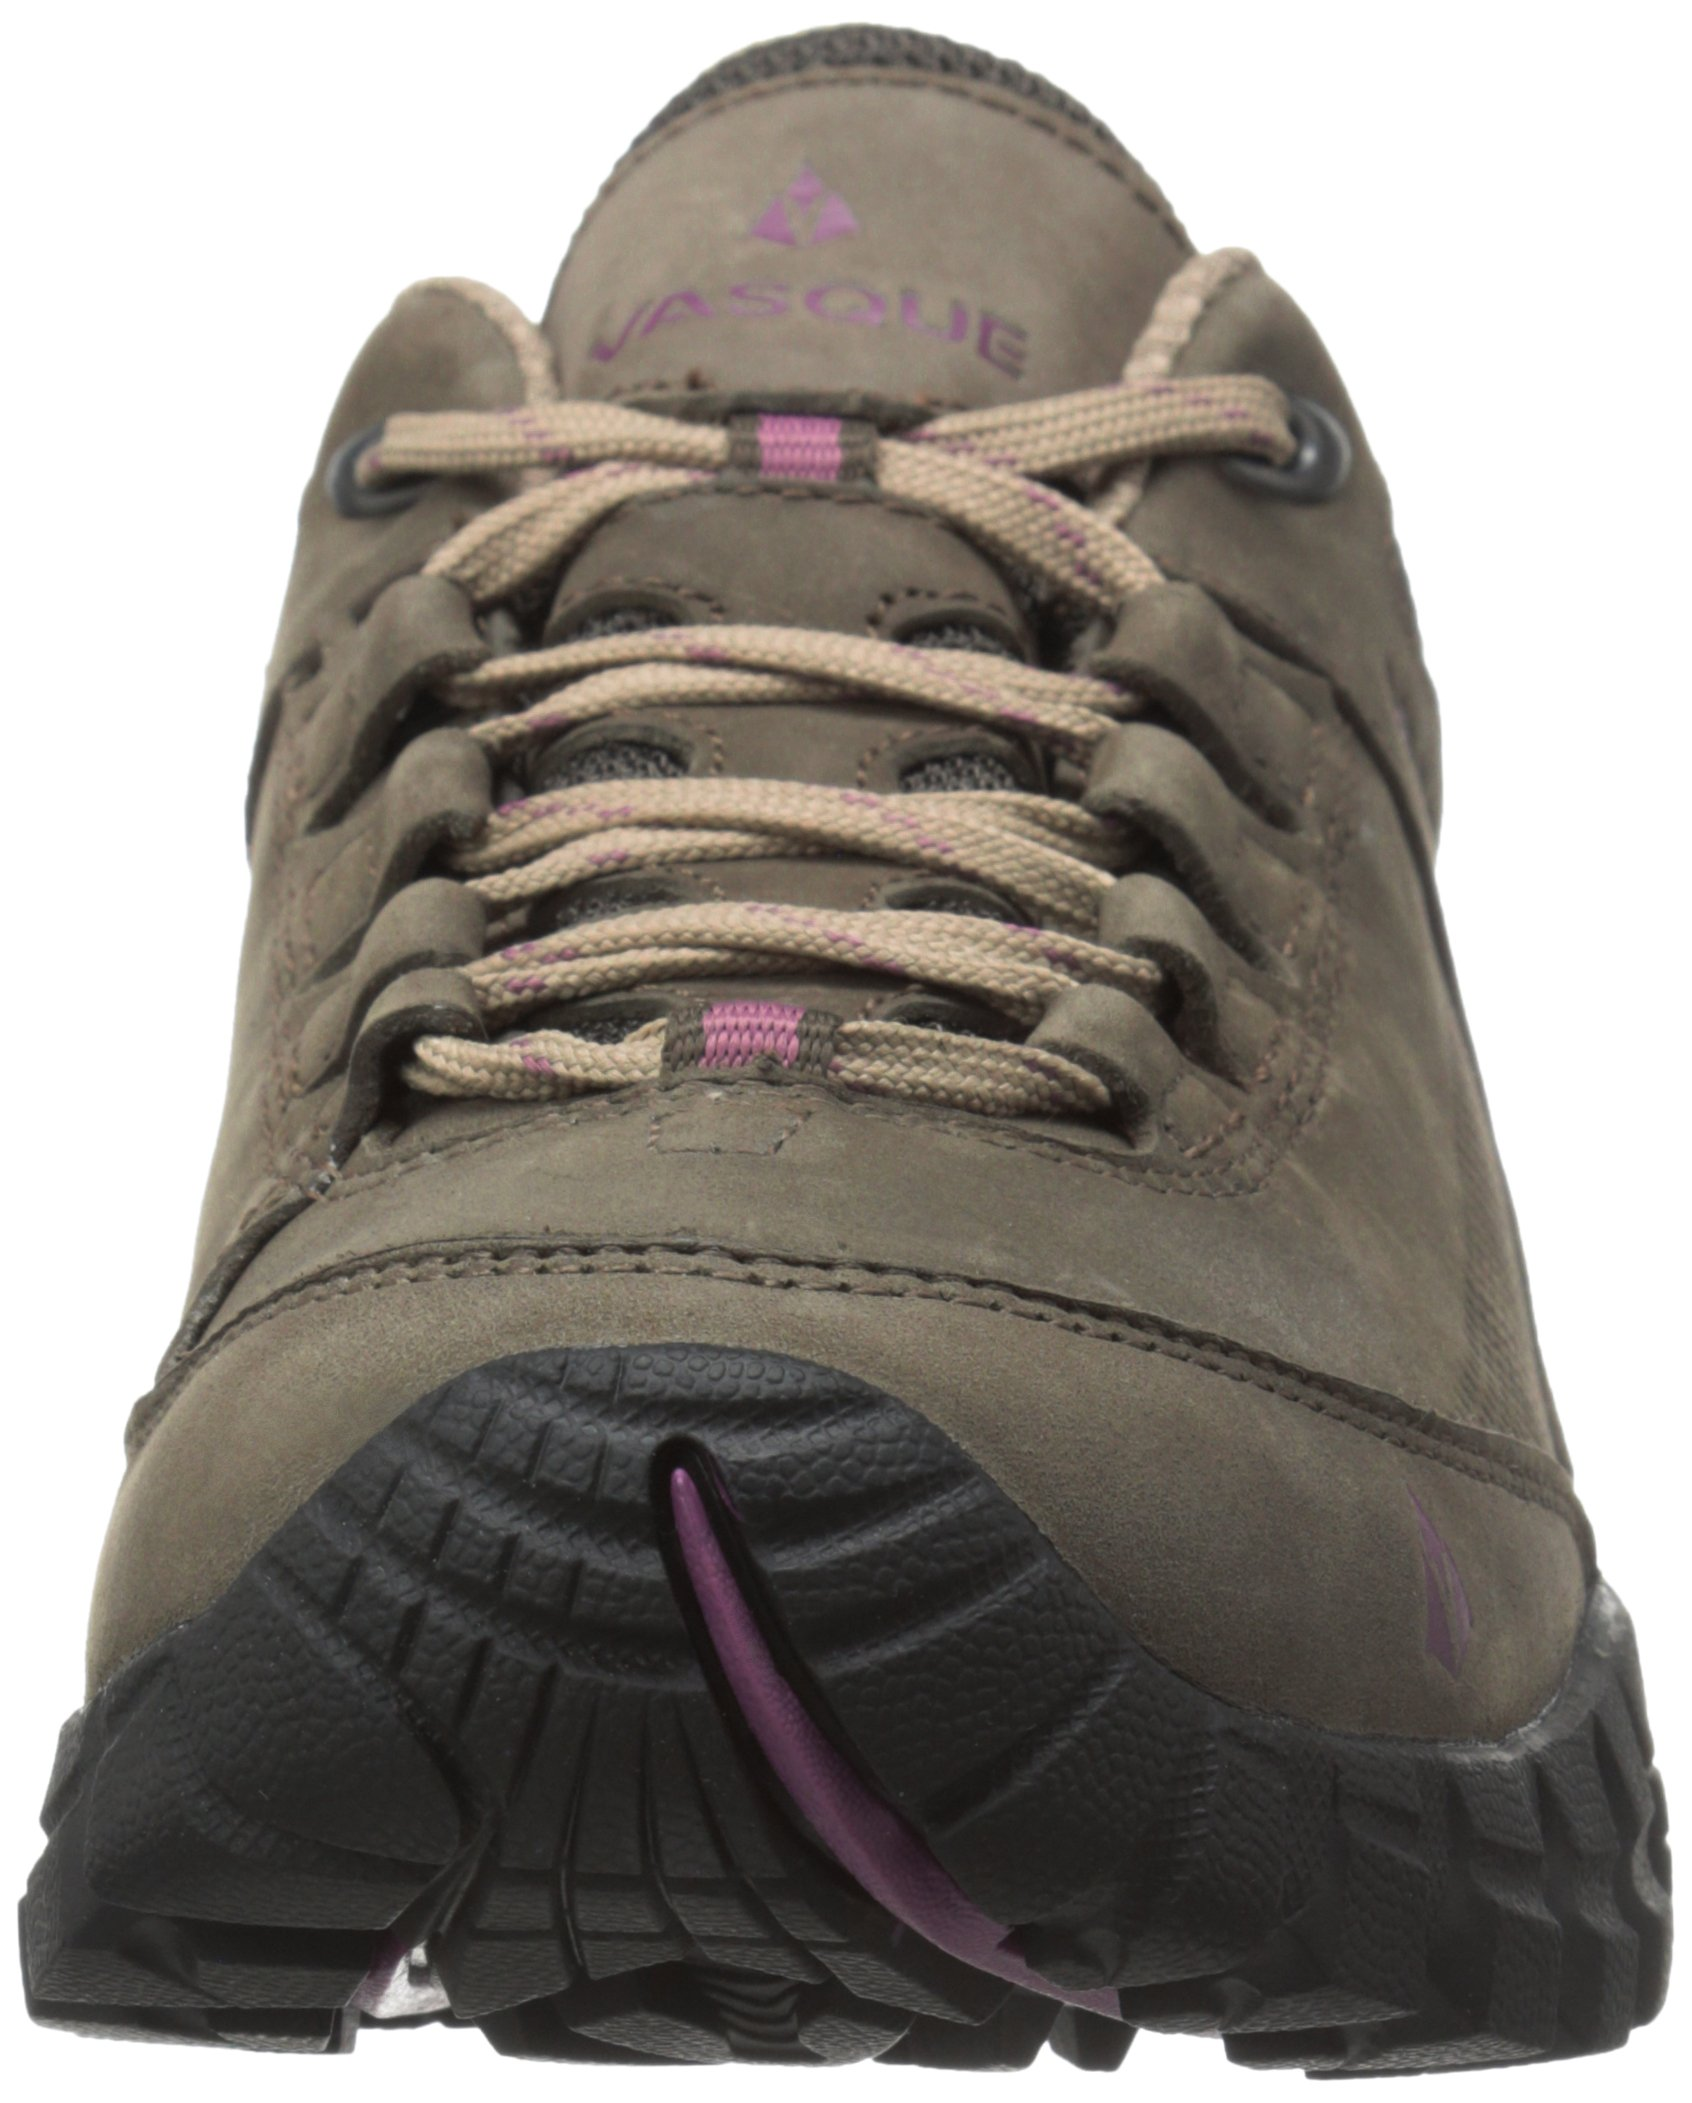 Vasque Women's Talus Trek Low UltraDry Hiking Shoe, Black Olive/Damson, 8.5 M US by Vasque (Image #4)